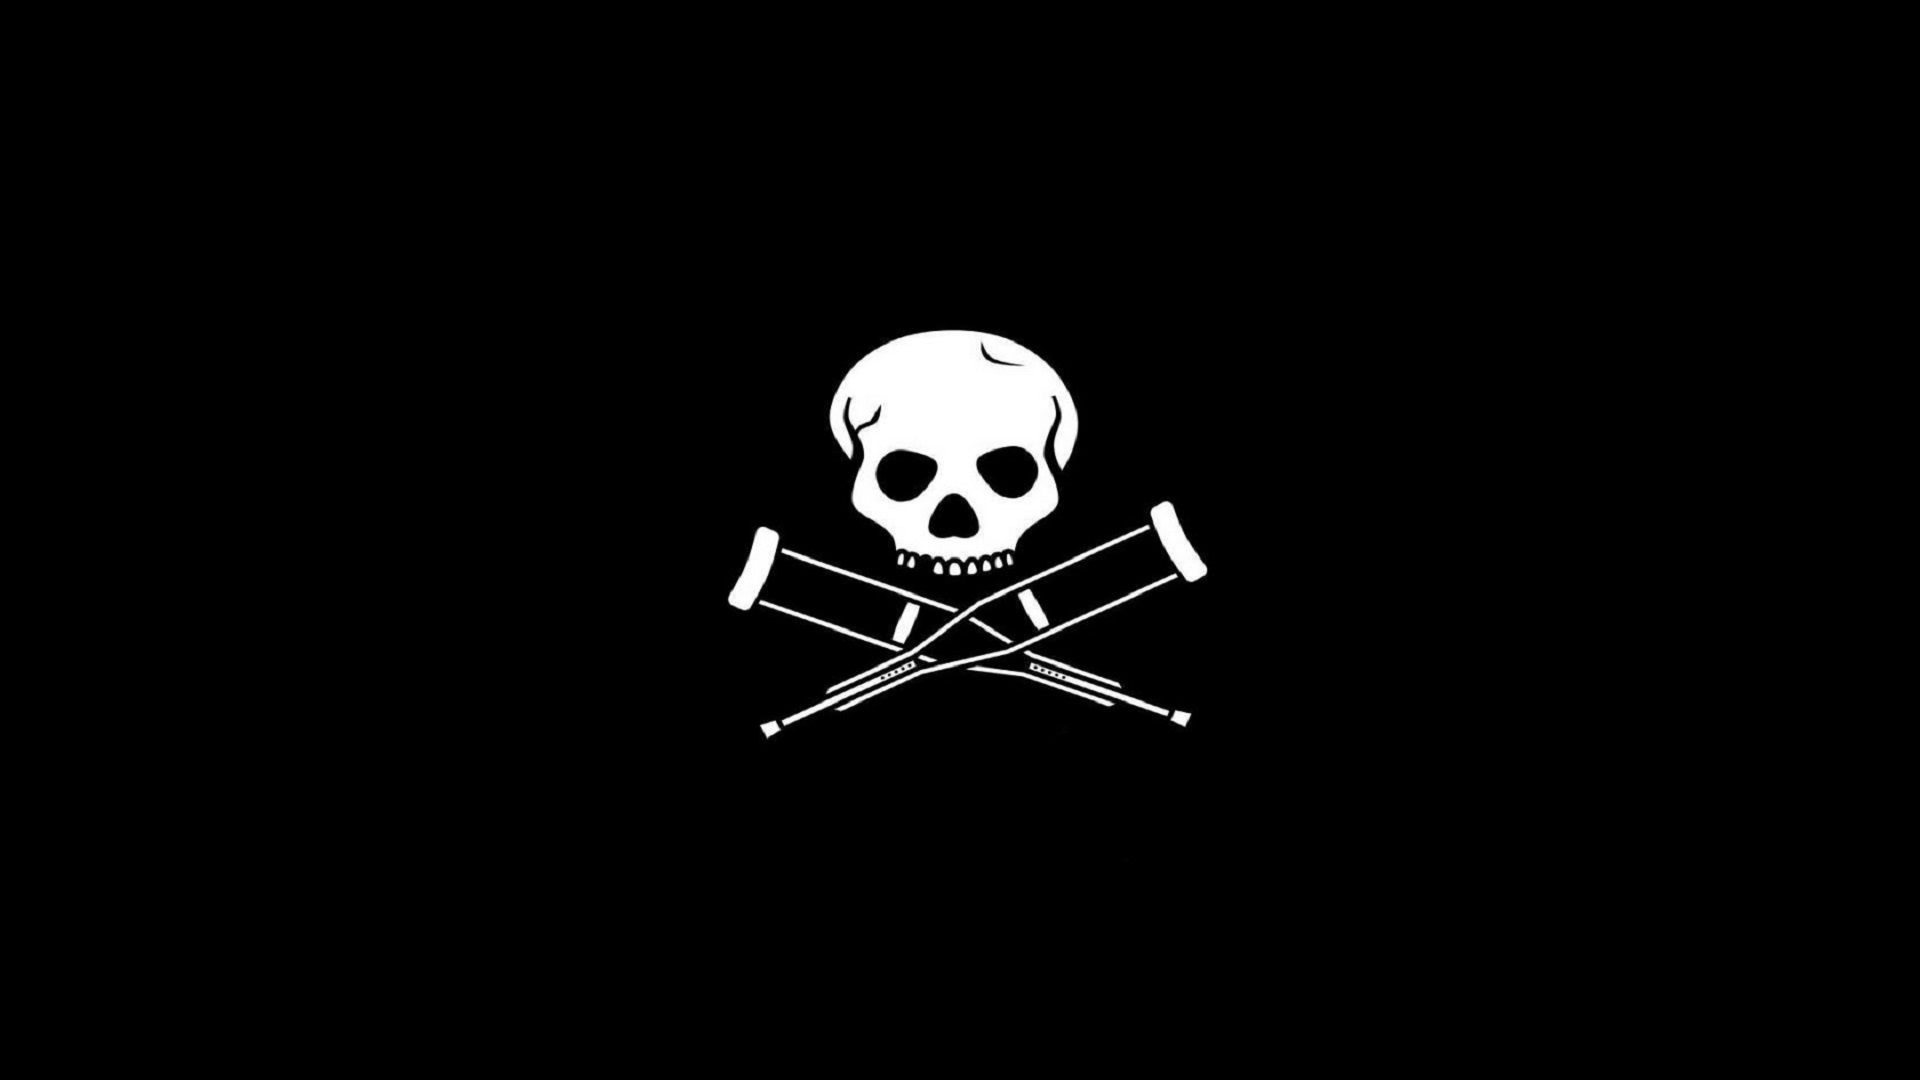 Skull And Bones 2018 Video Game 4k Hd Desktop Wallpaper: Download Skull And Bones HD Wallpapers